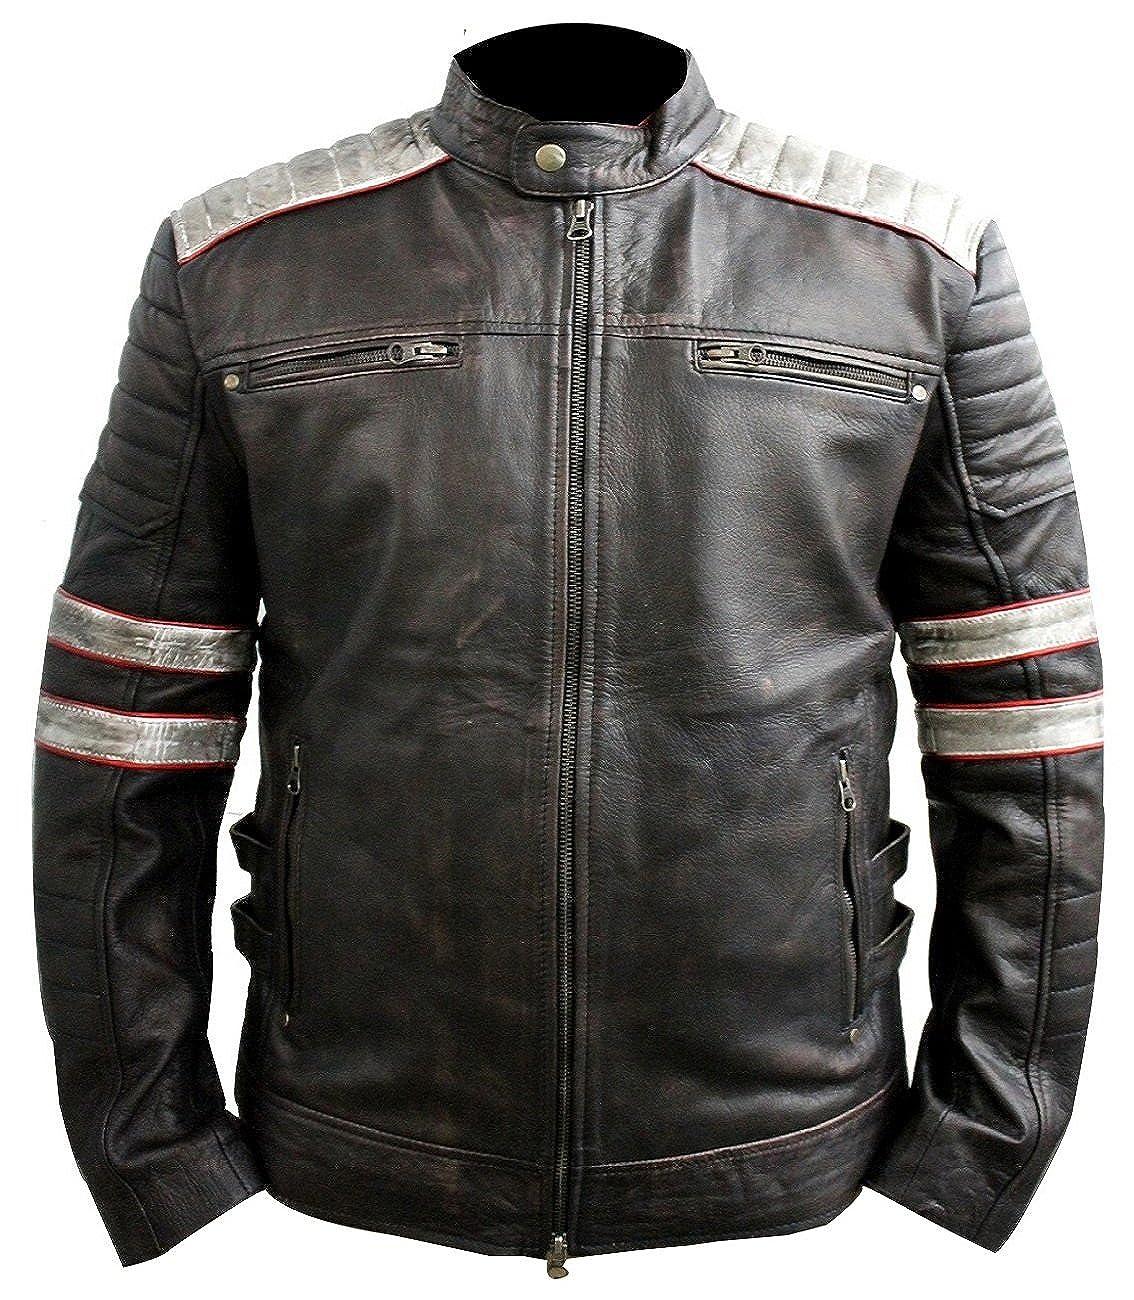 Hollywood Jacket Vintage Motorcycle Jackets For Men   Vintage Motorcycle  Jacket   Cafe Racer Leather Motorcycle Jacket at Amazon Men's Clothing  store: